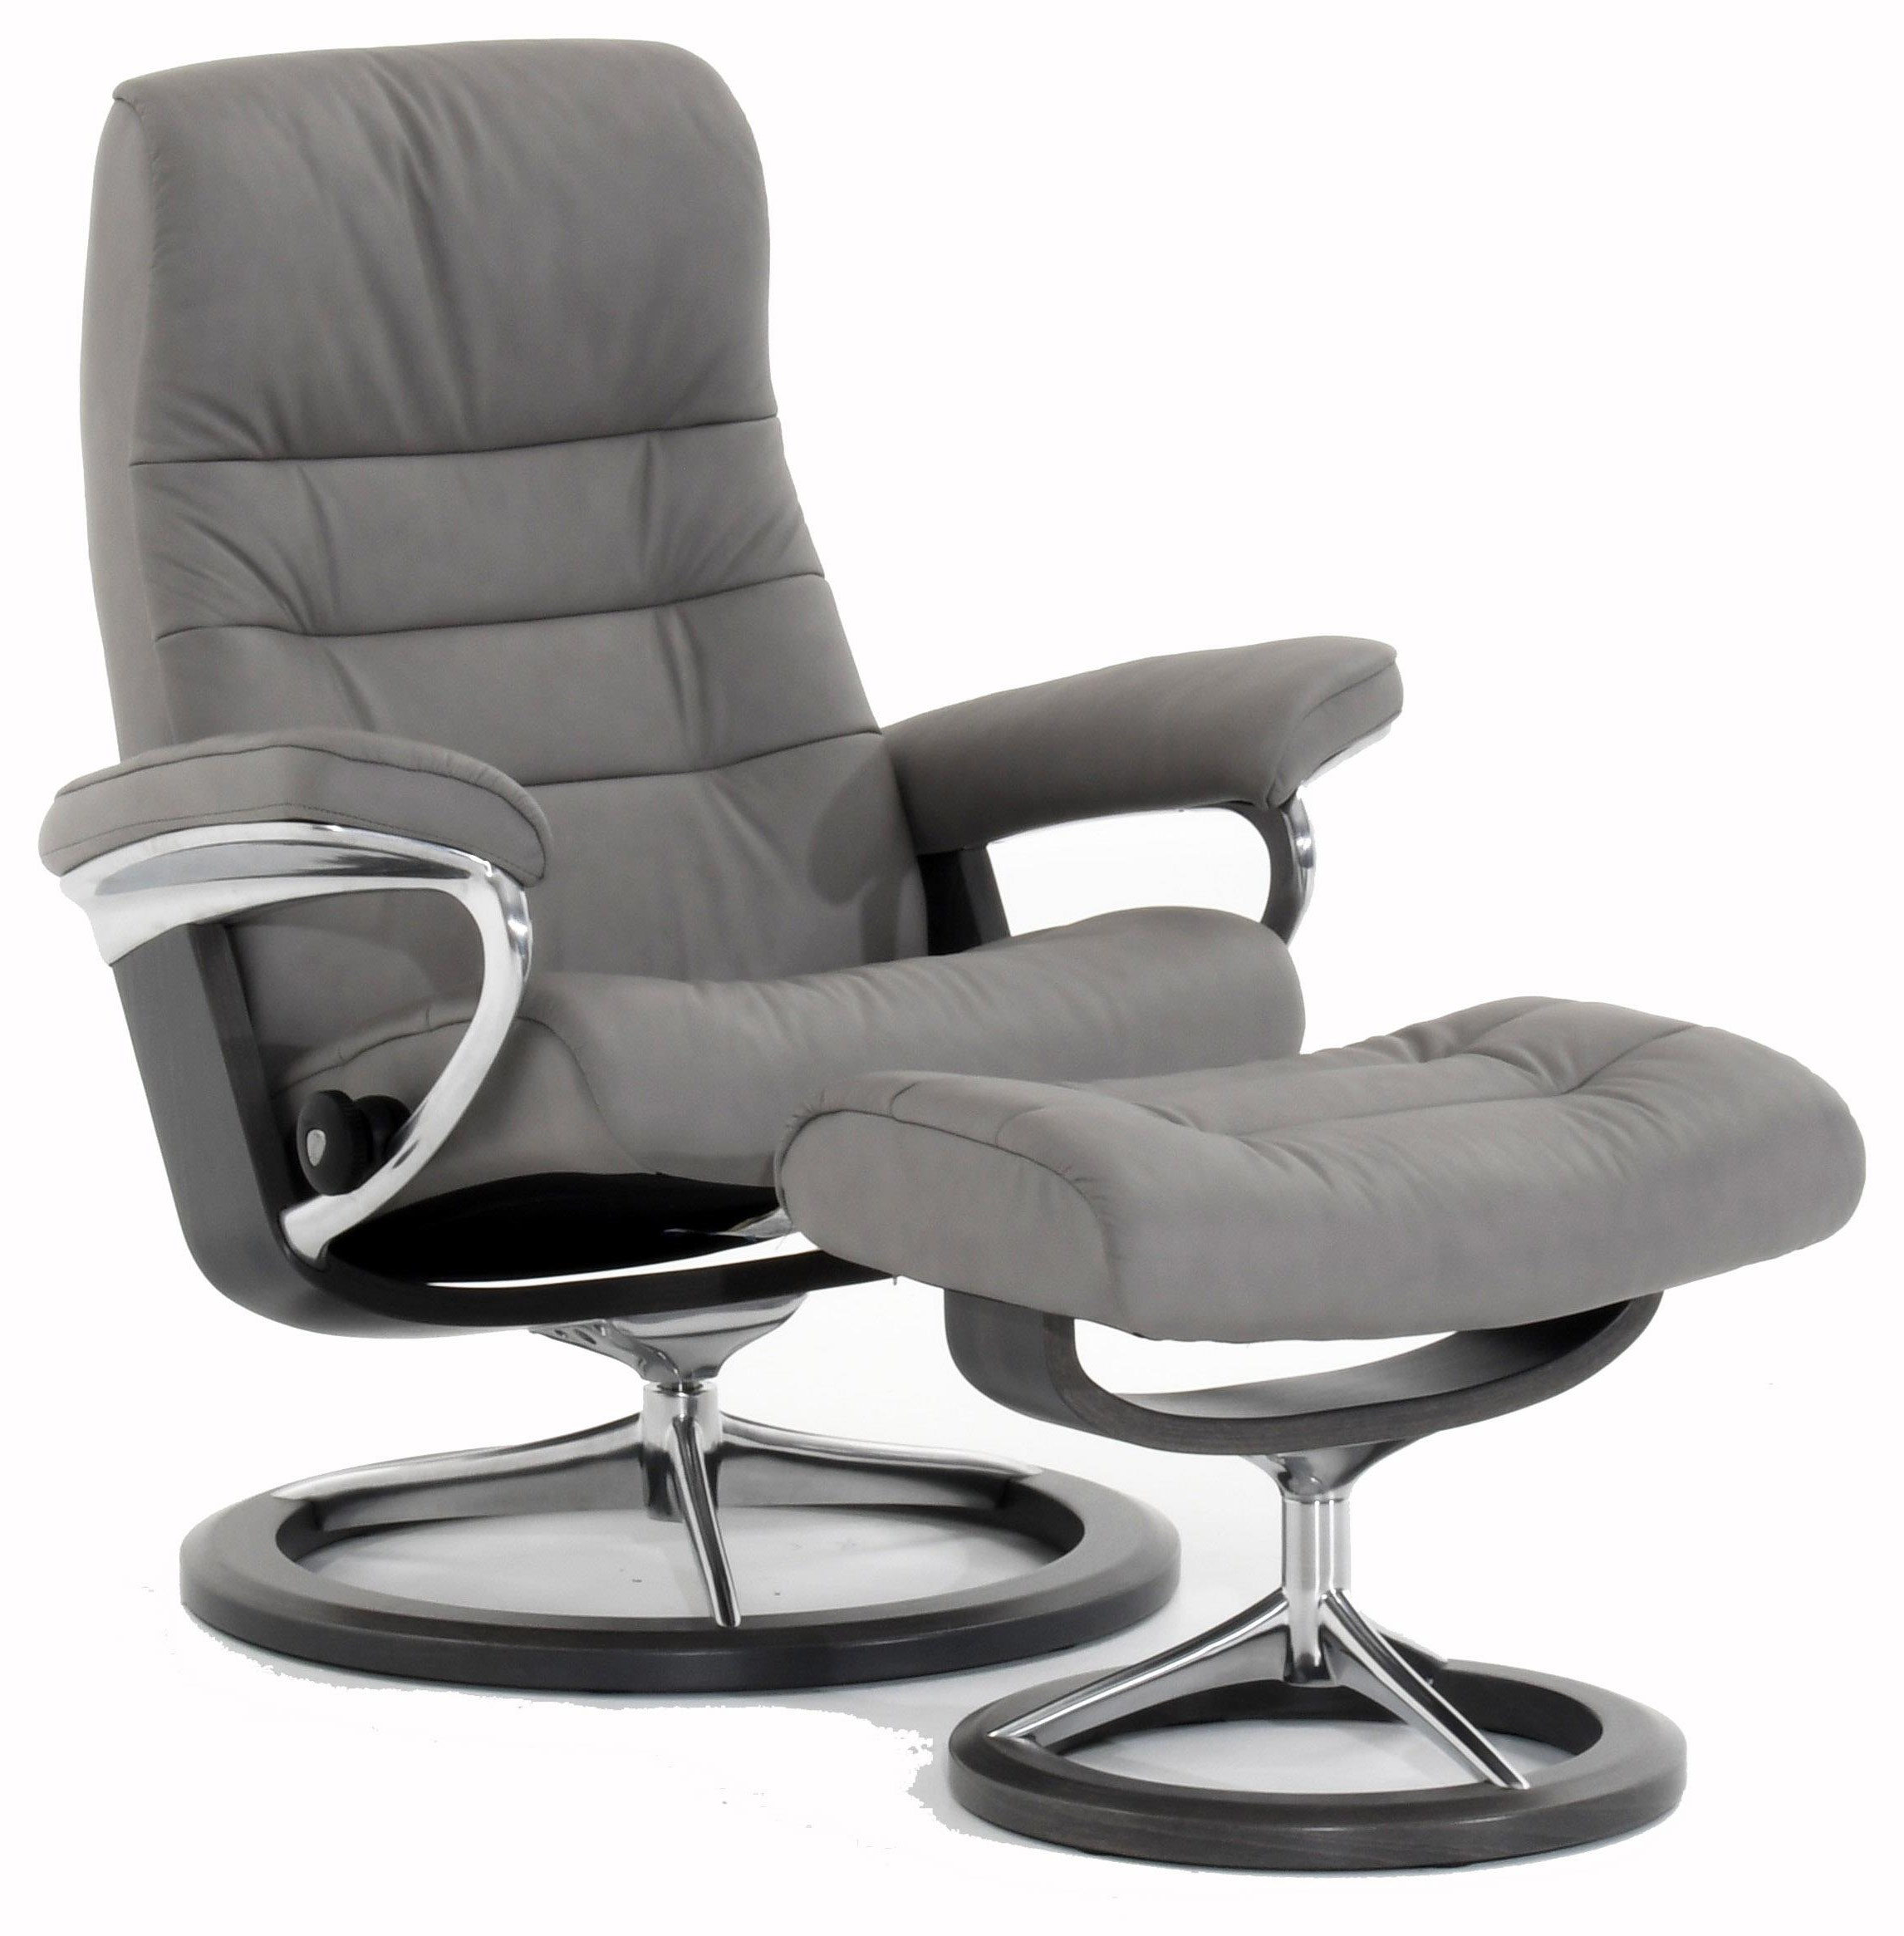 Opal Medium Opal Signature Chair by Stressless at Baer's Furniture